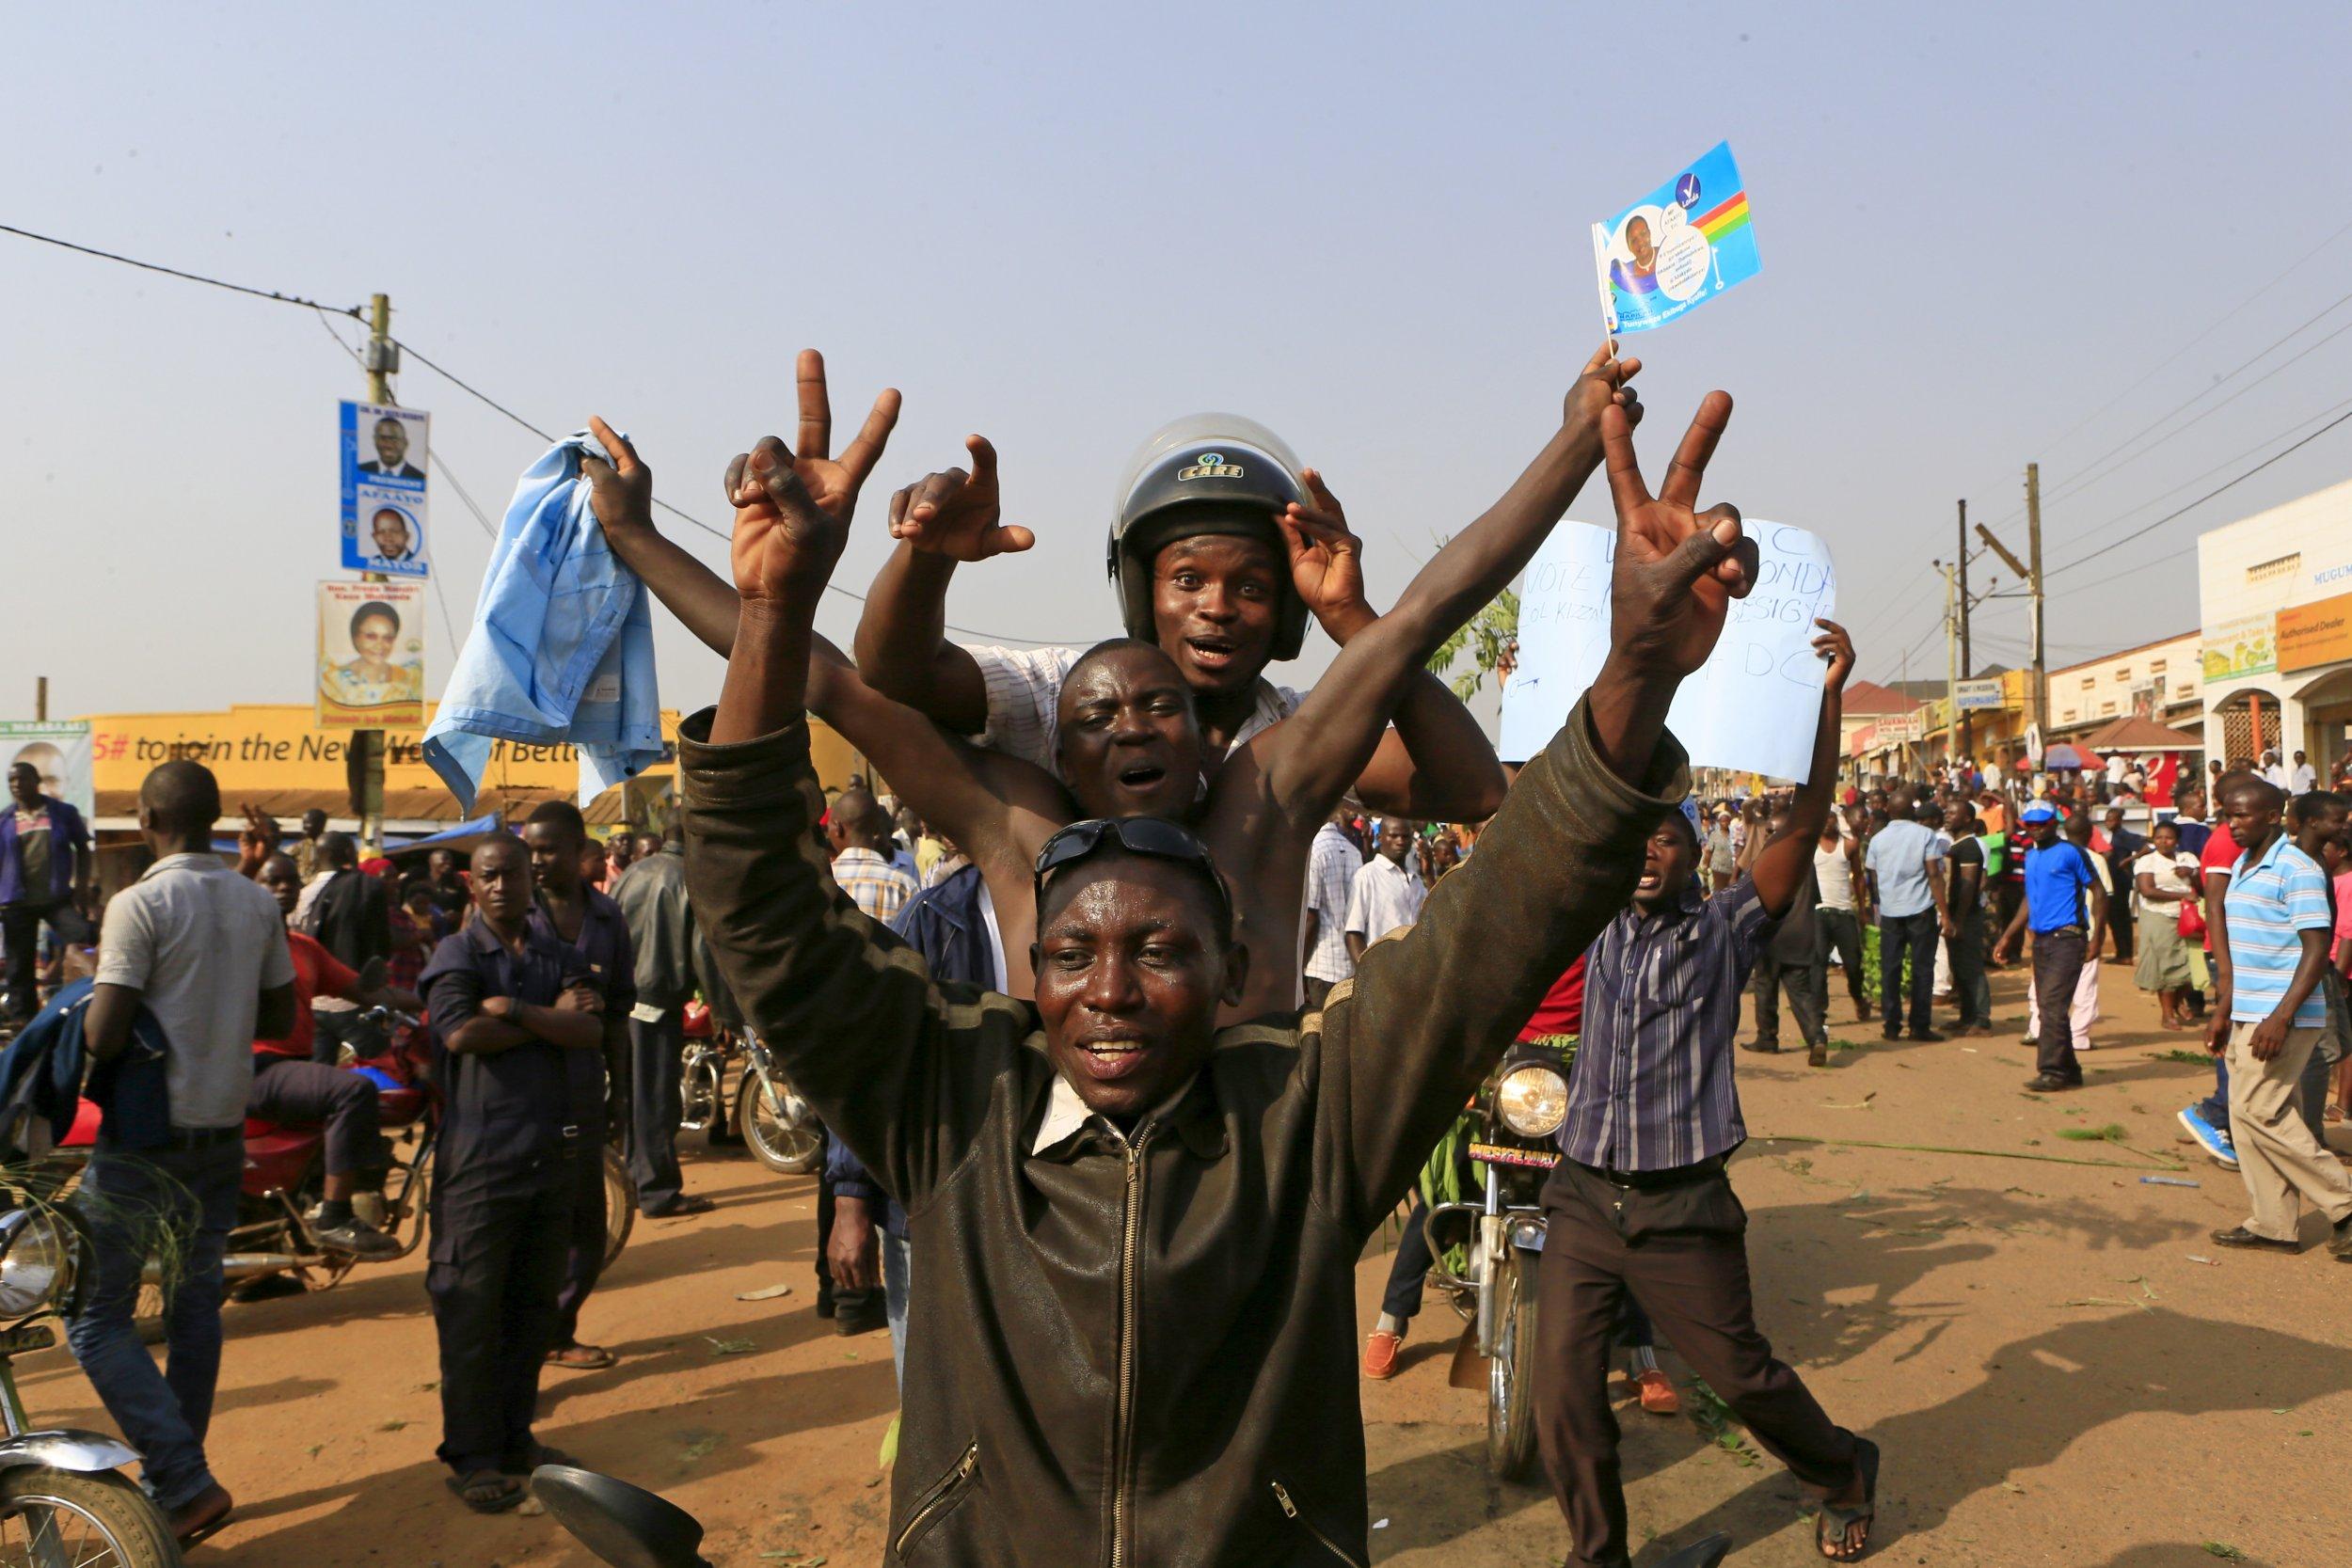 Kizza Besigye supporters gesture in Uganda ahead of elections, where Besigye challenges Yoweri Museveni.